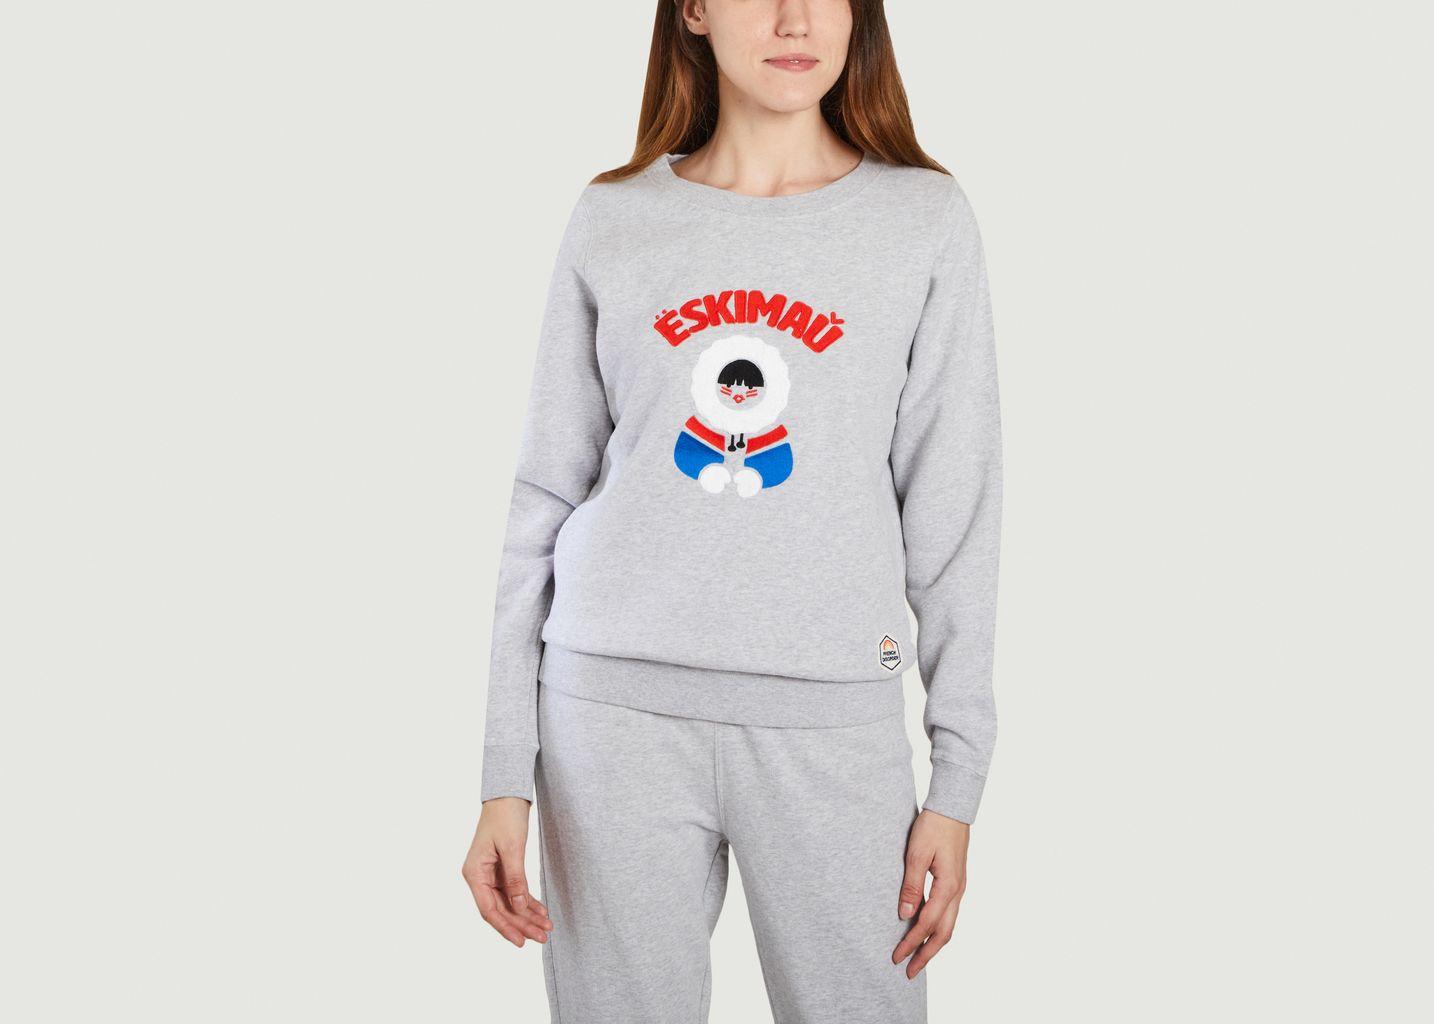 Sweatshirt Eskimau - French Disorder